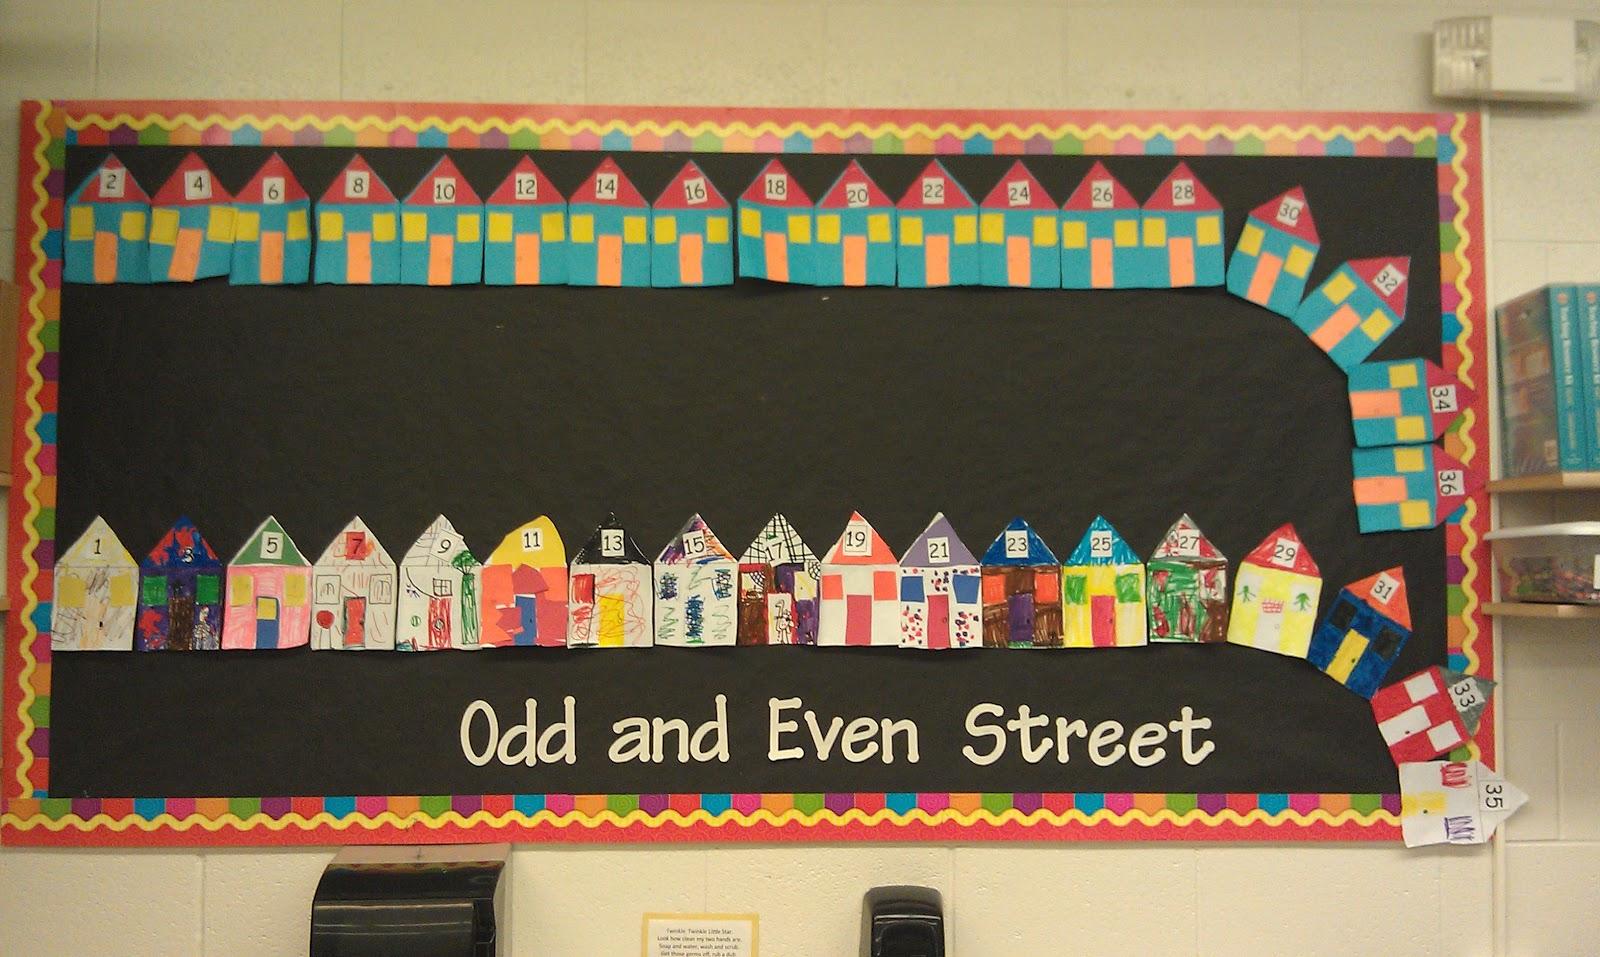 The Sharpened Pencil Even Odd Street